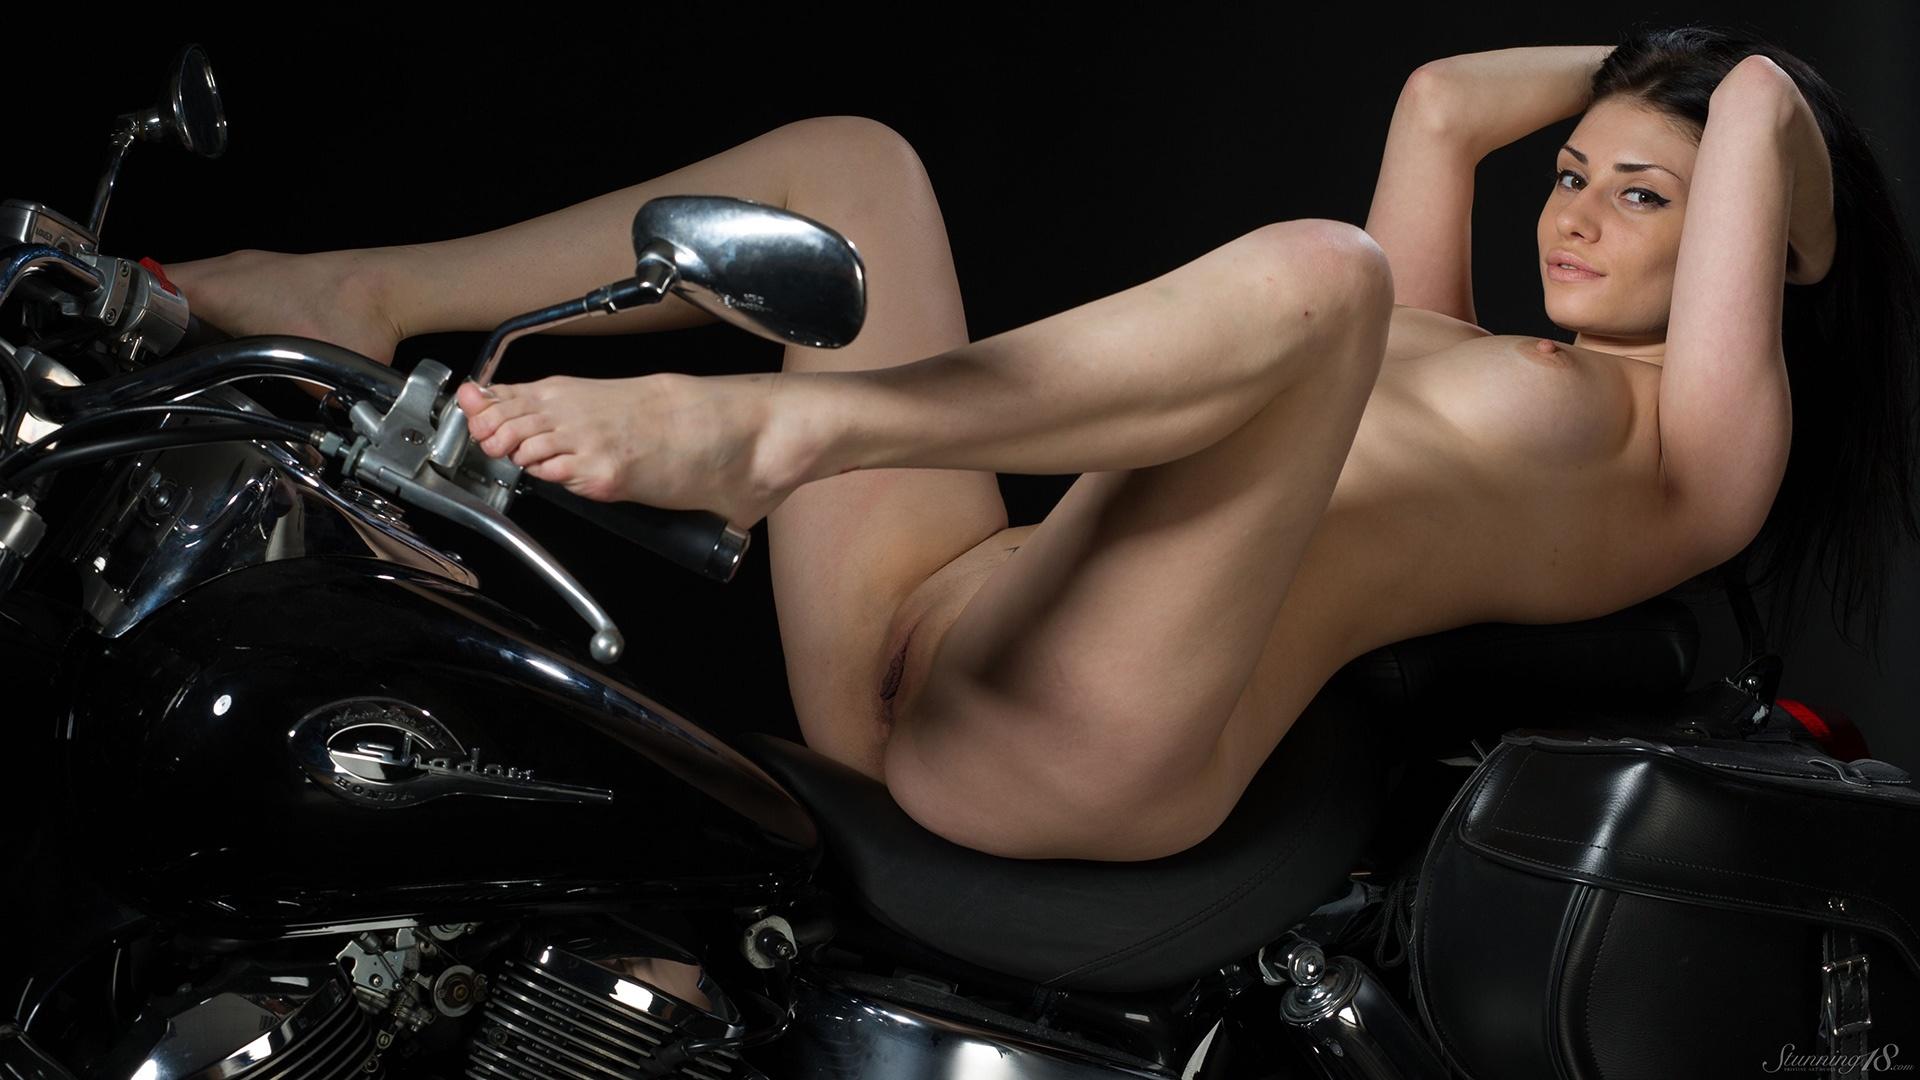 Nude photos of prancer